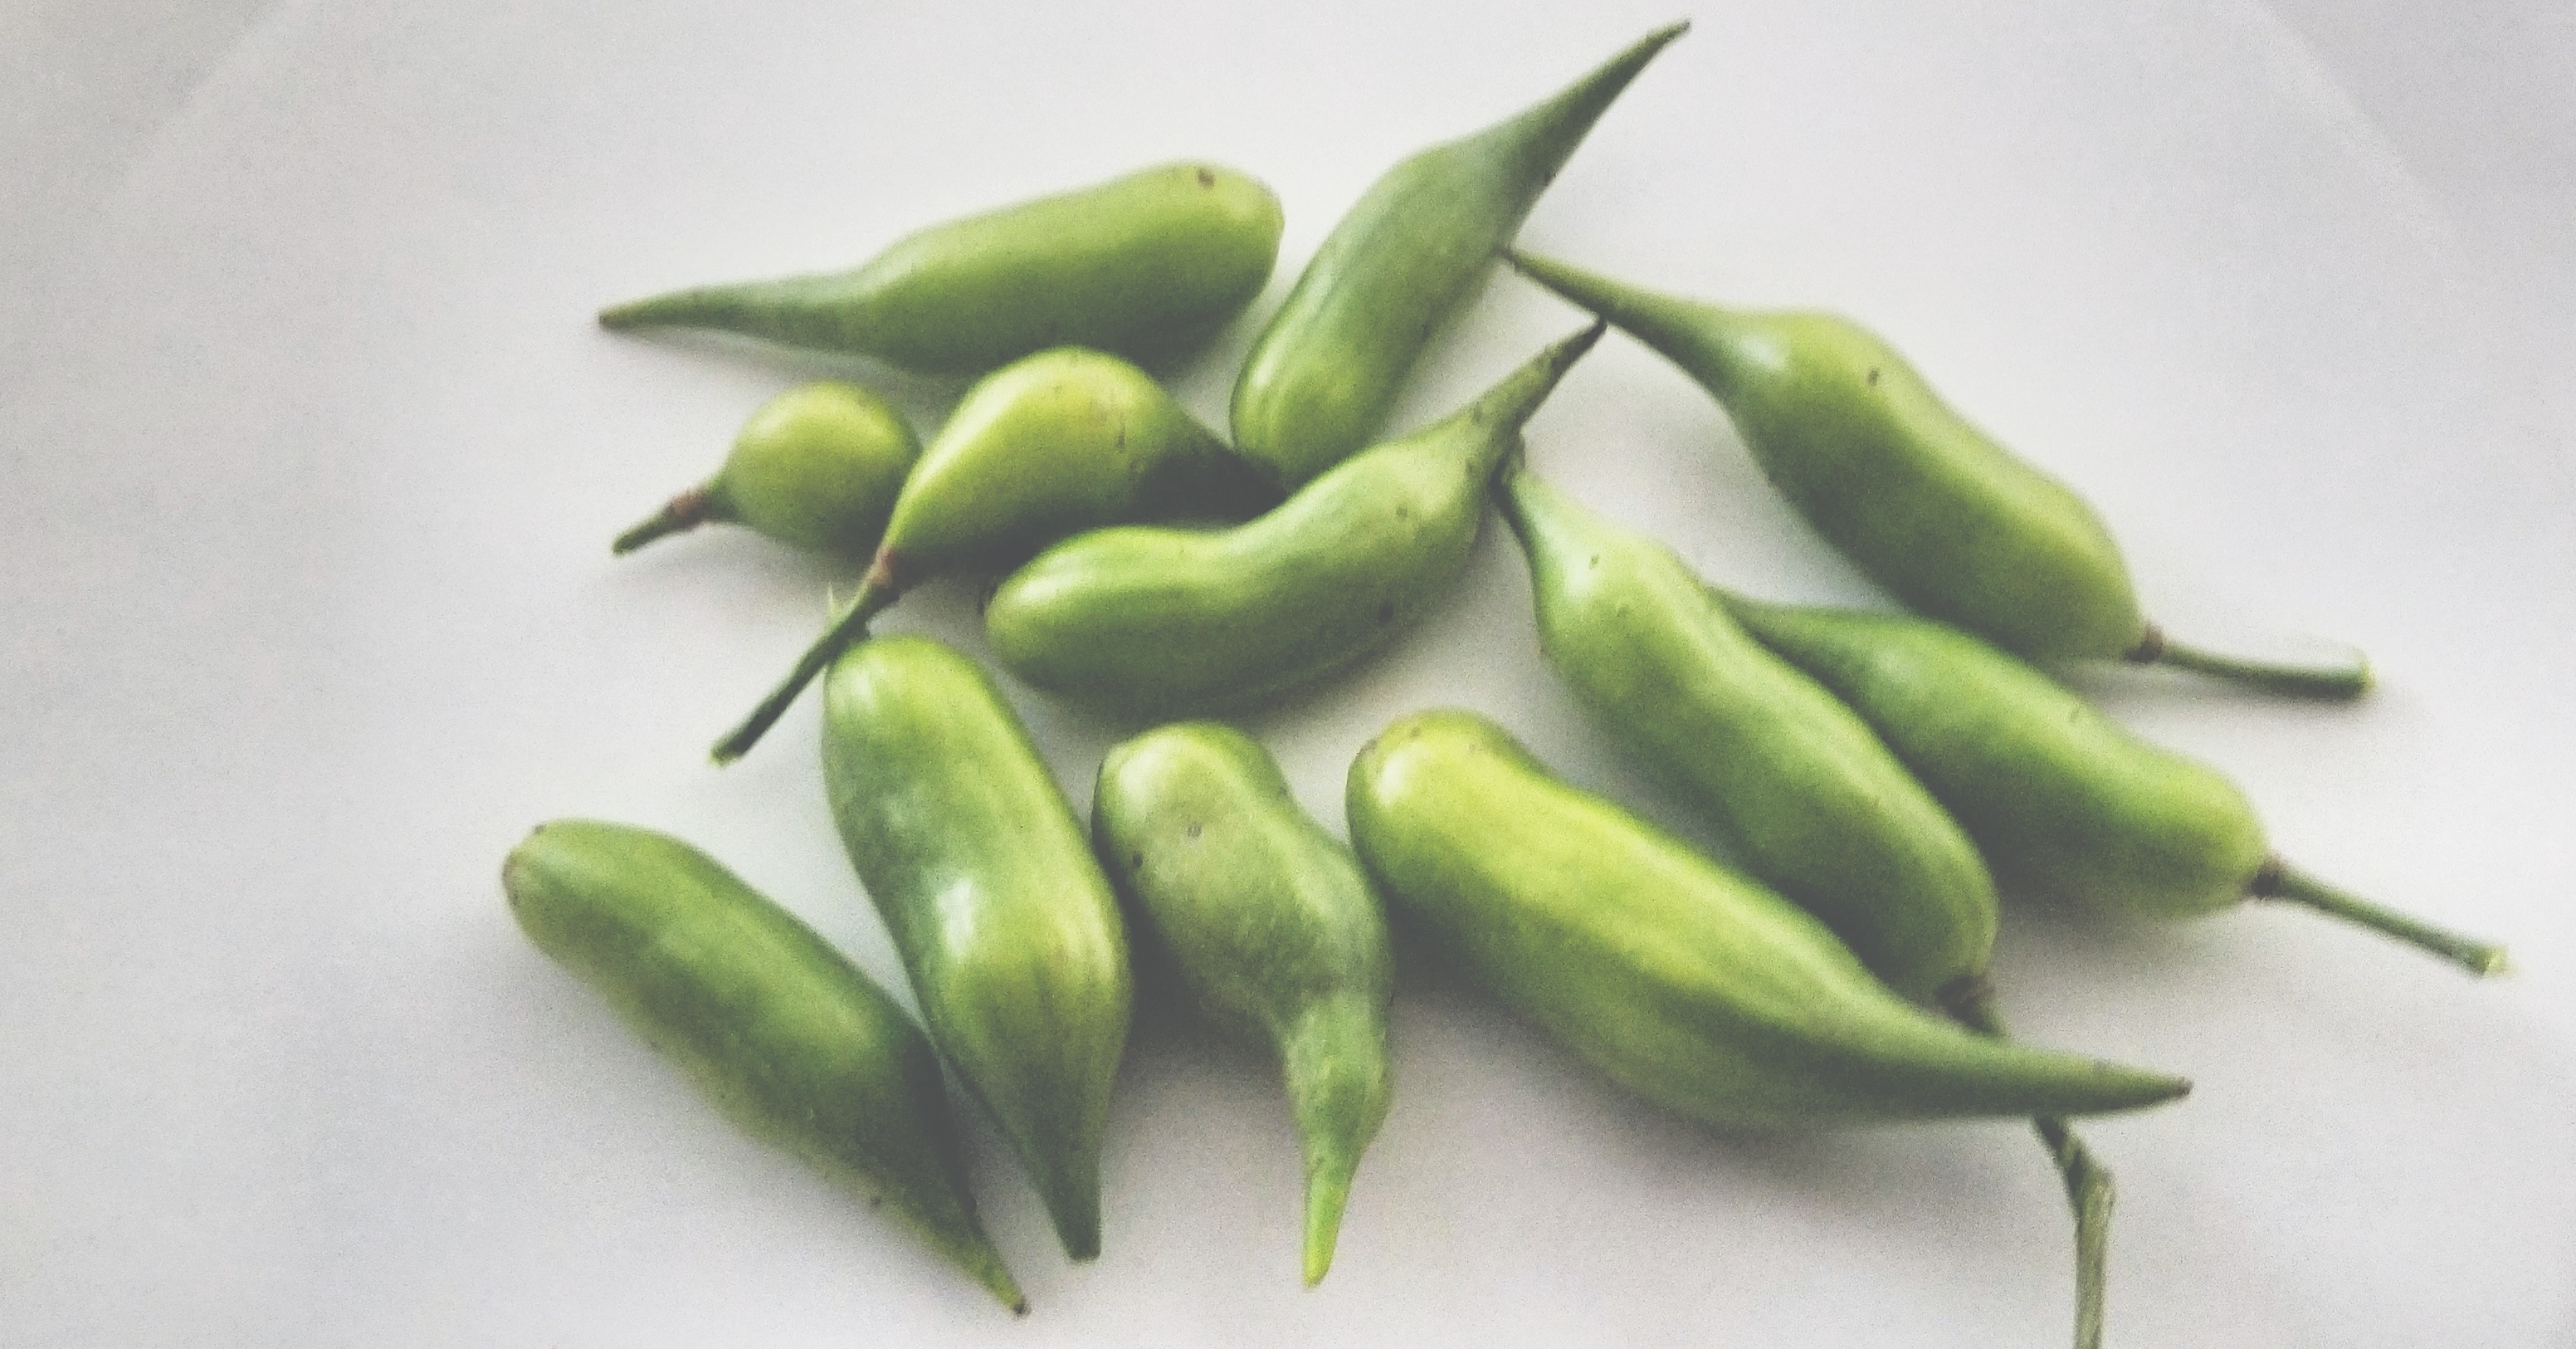 radish seedpods